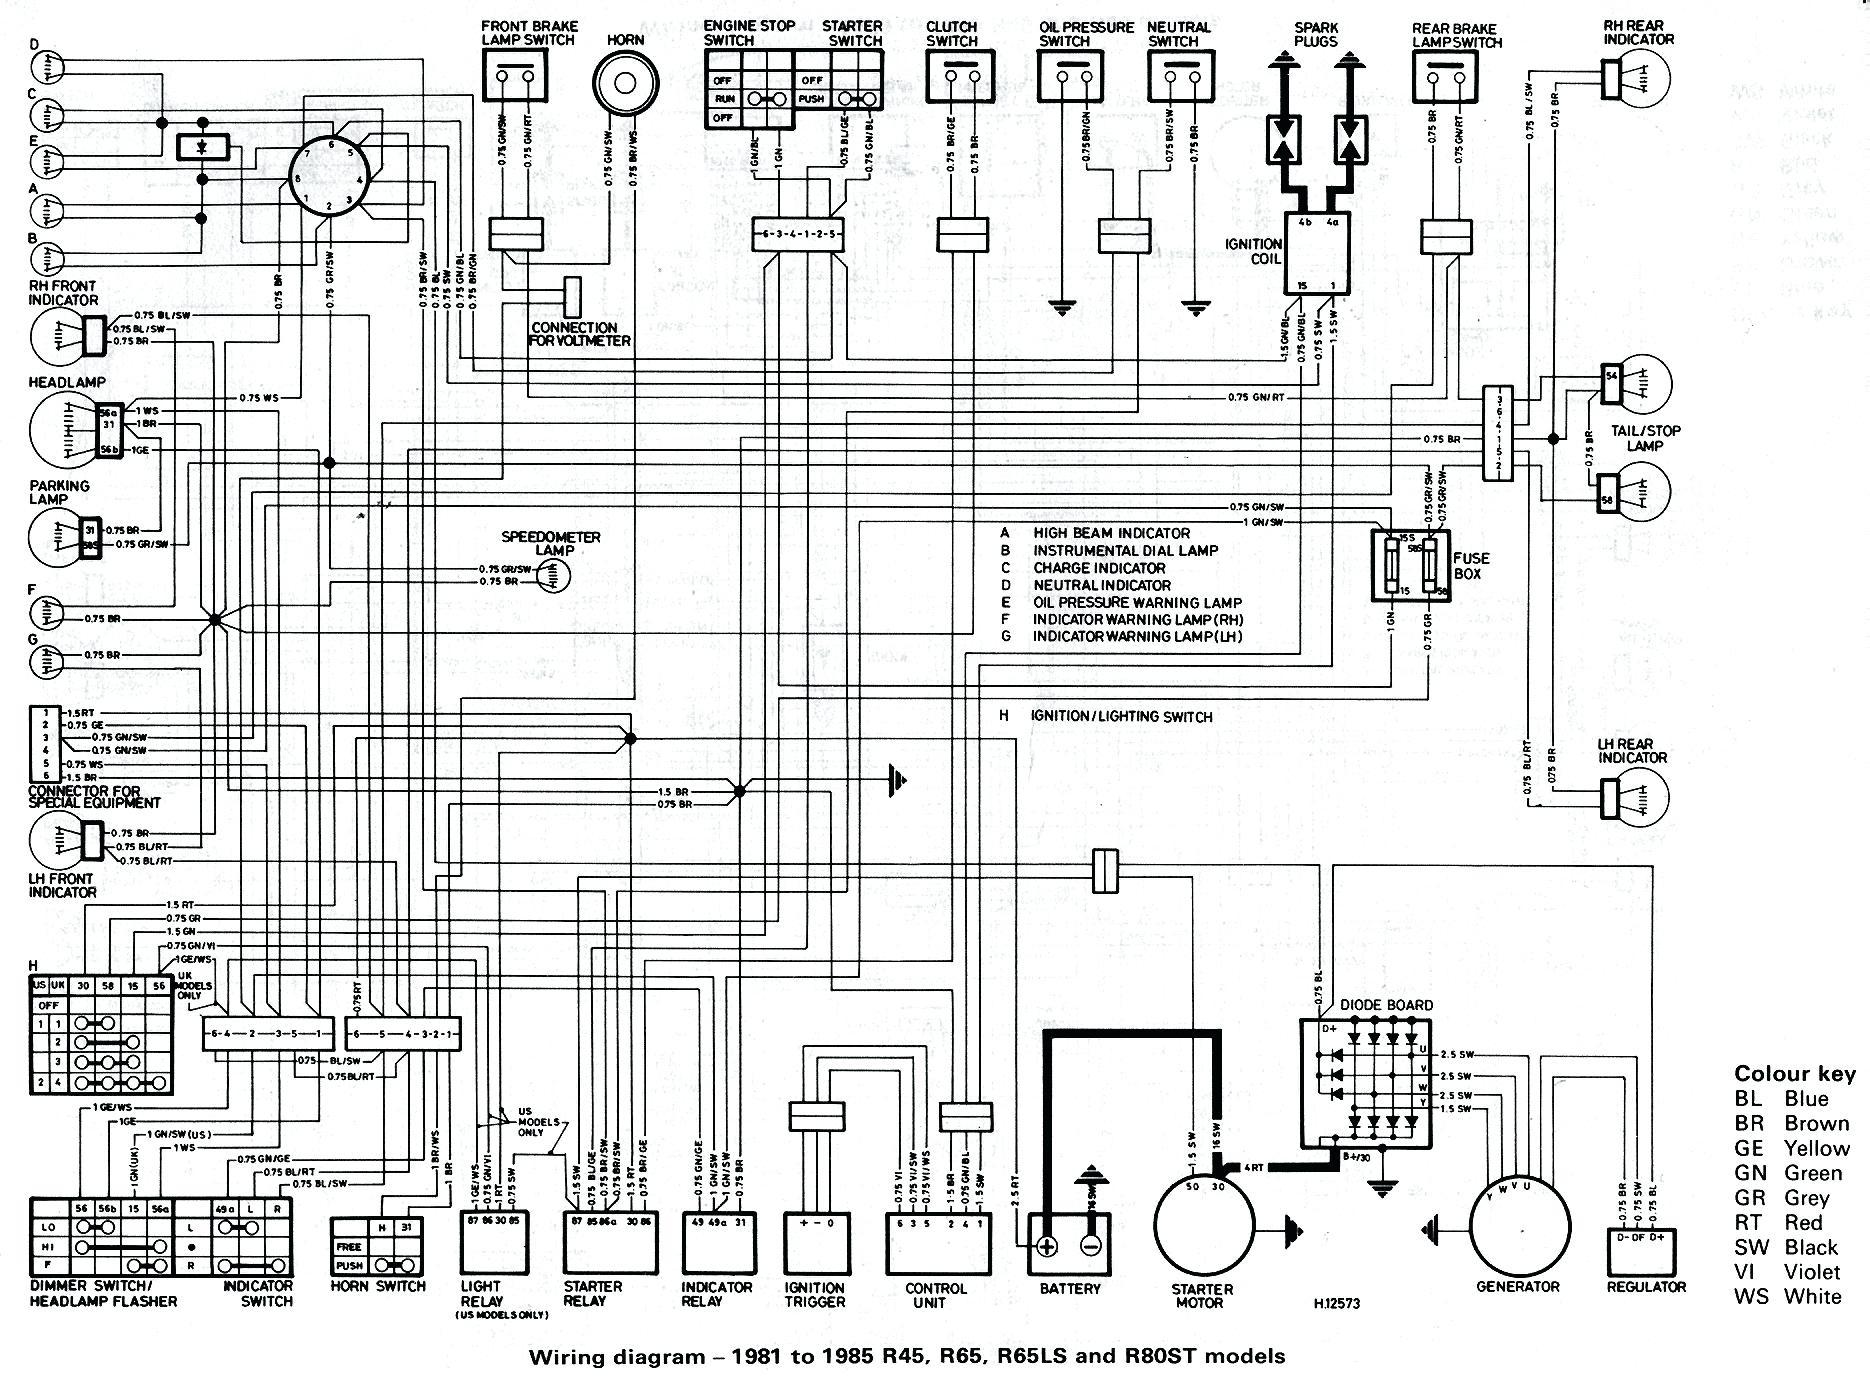 Tremendous 1979 Camaro Wiring Harness Wiring Diagram Database Wiring Cloud Apomsimijknierdonabenoleattemohammedshrineorg